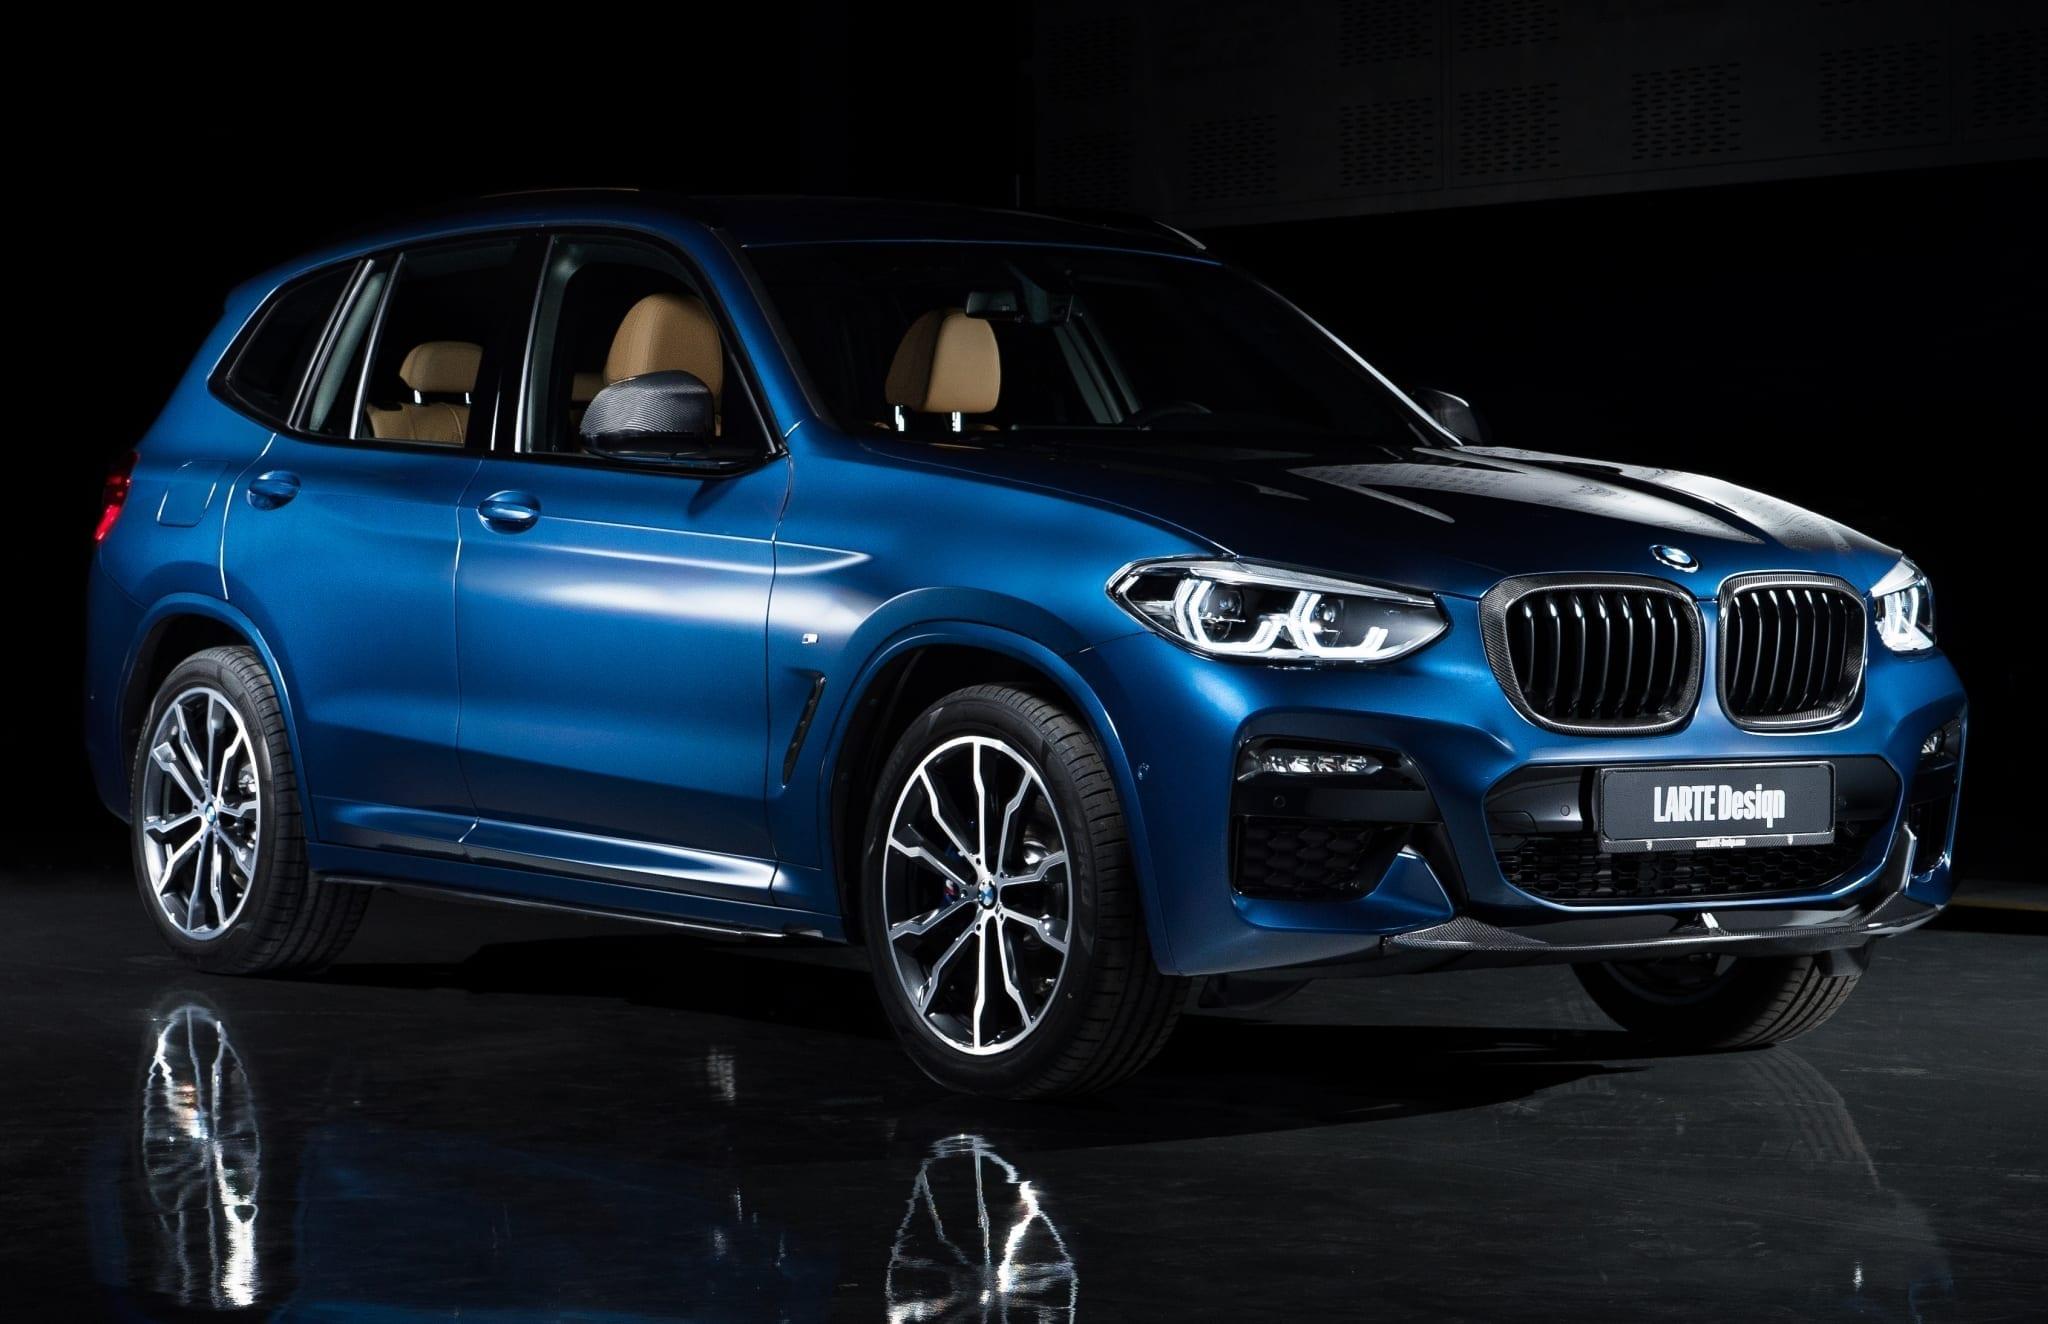 Manhart-Larte-Design-BMW-X3-X4-1